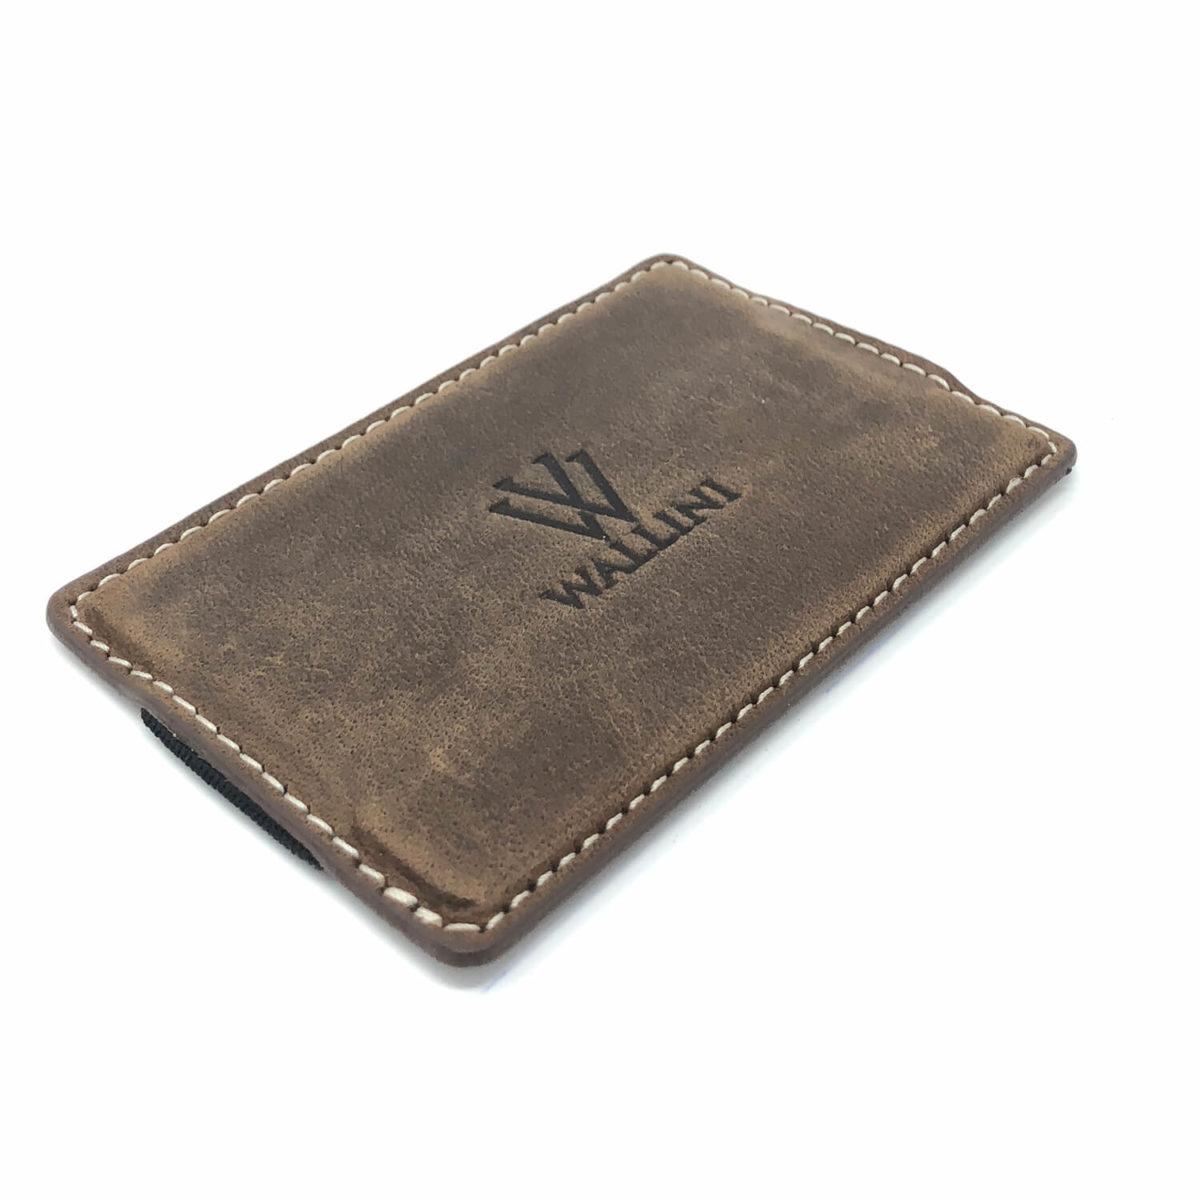 WALLINI Cardholder Umbra Ecru